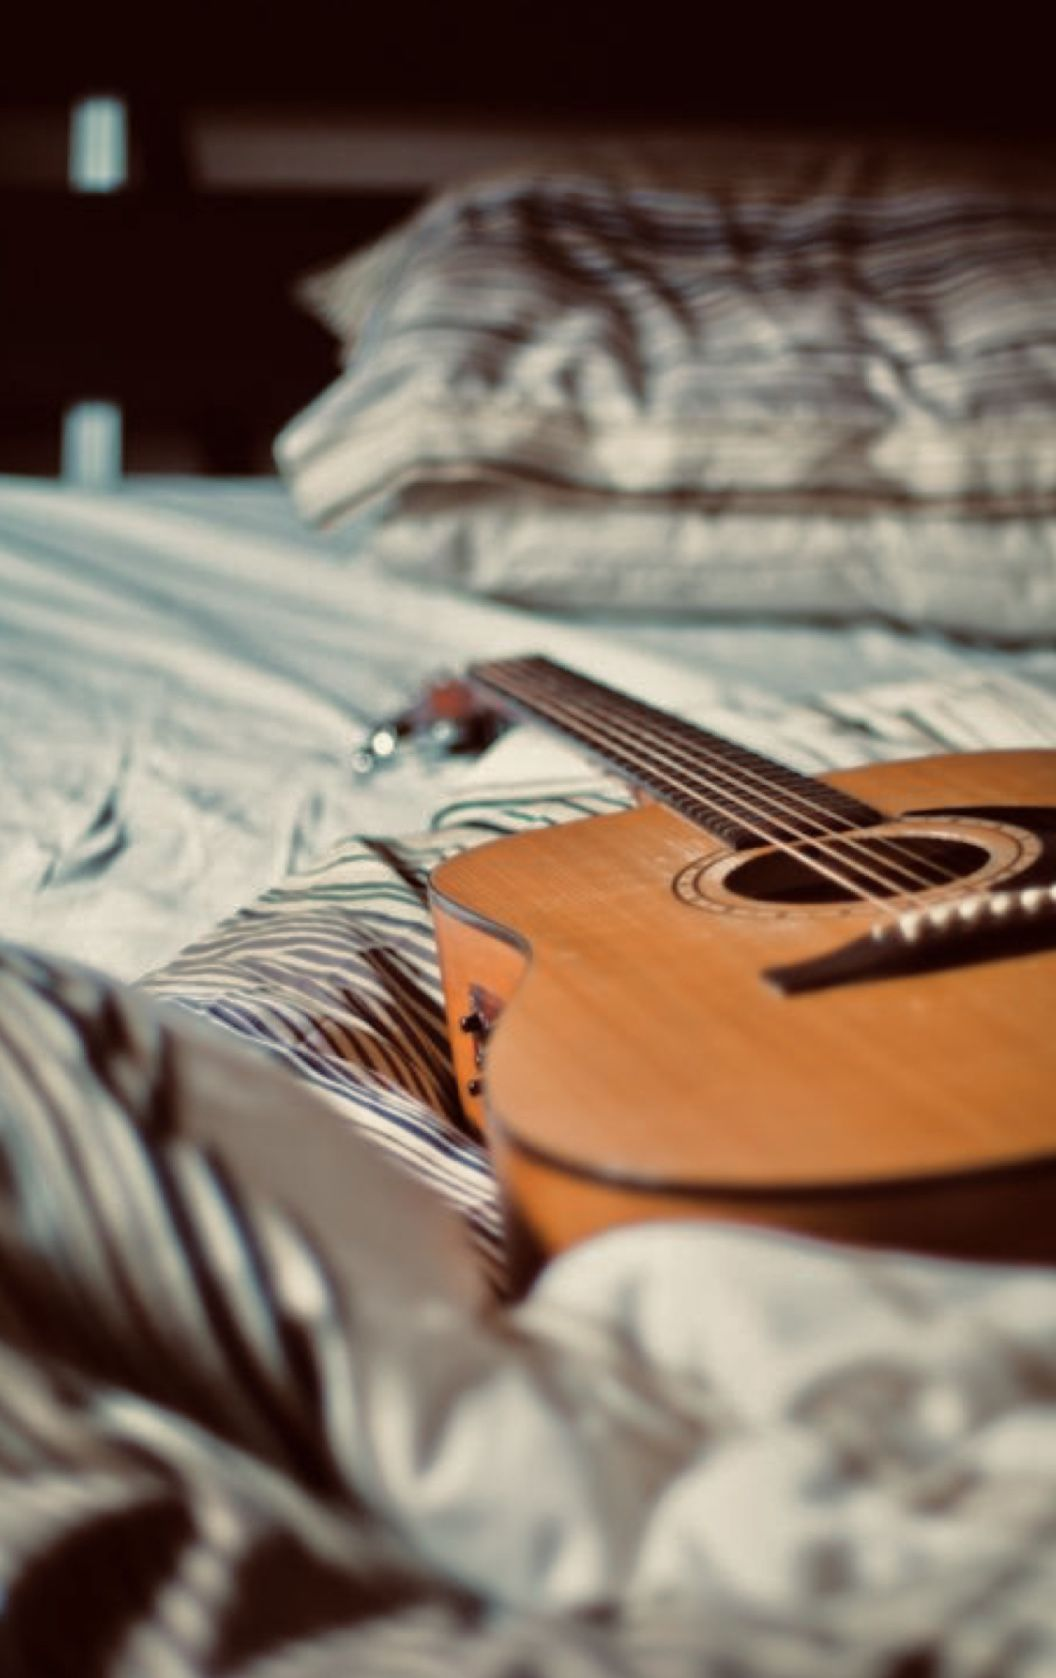 Pin By C A R M E N On U K U L E L E In 2020 Guitar Music Love Music Guitar